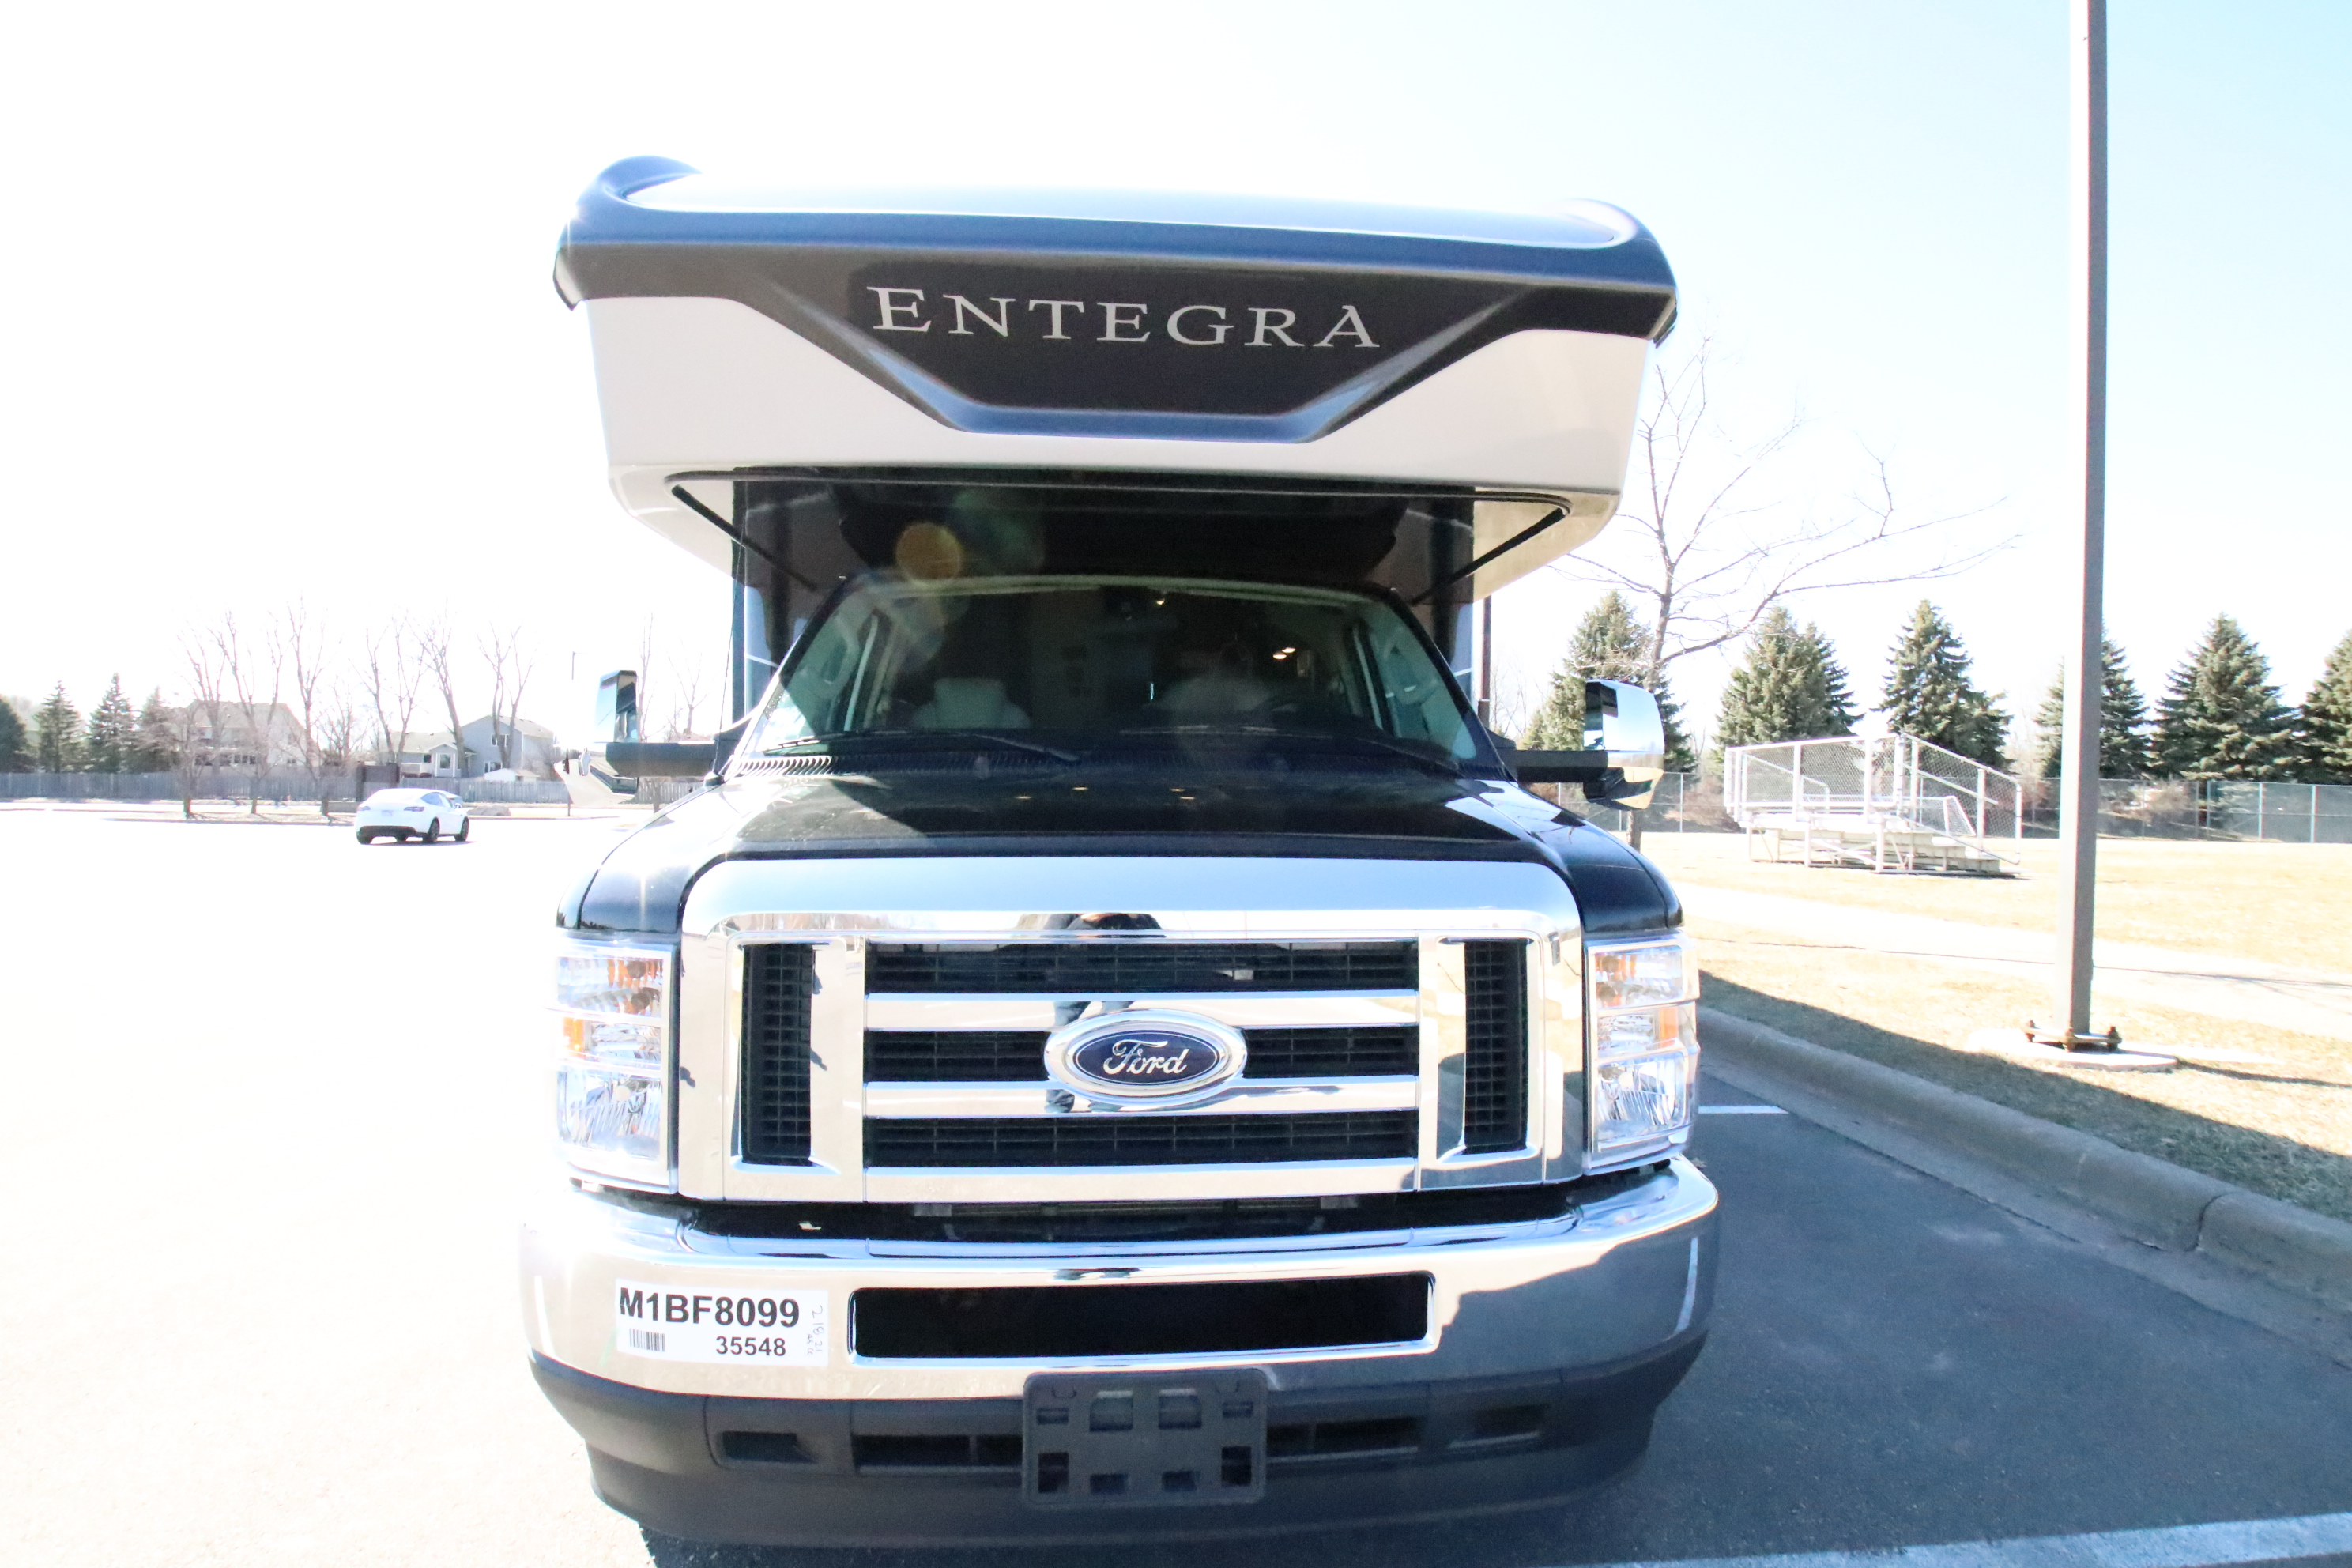 Entegra Coach Esteem 31f